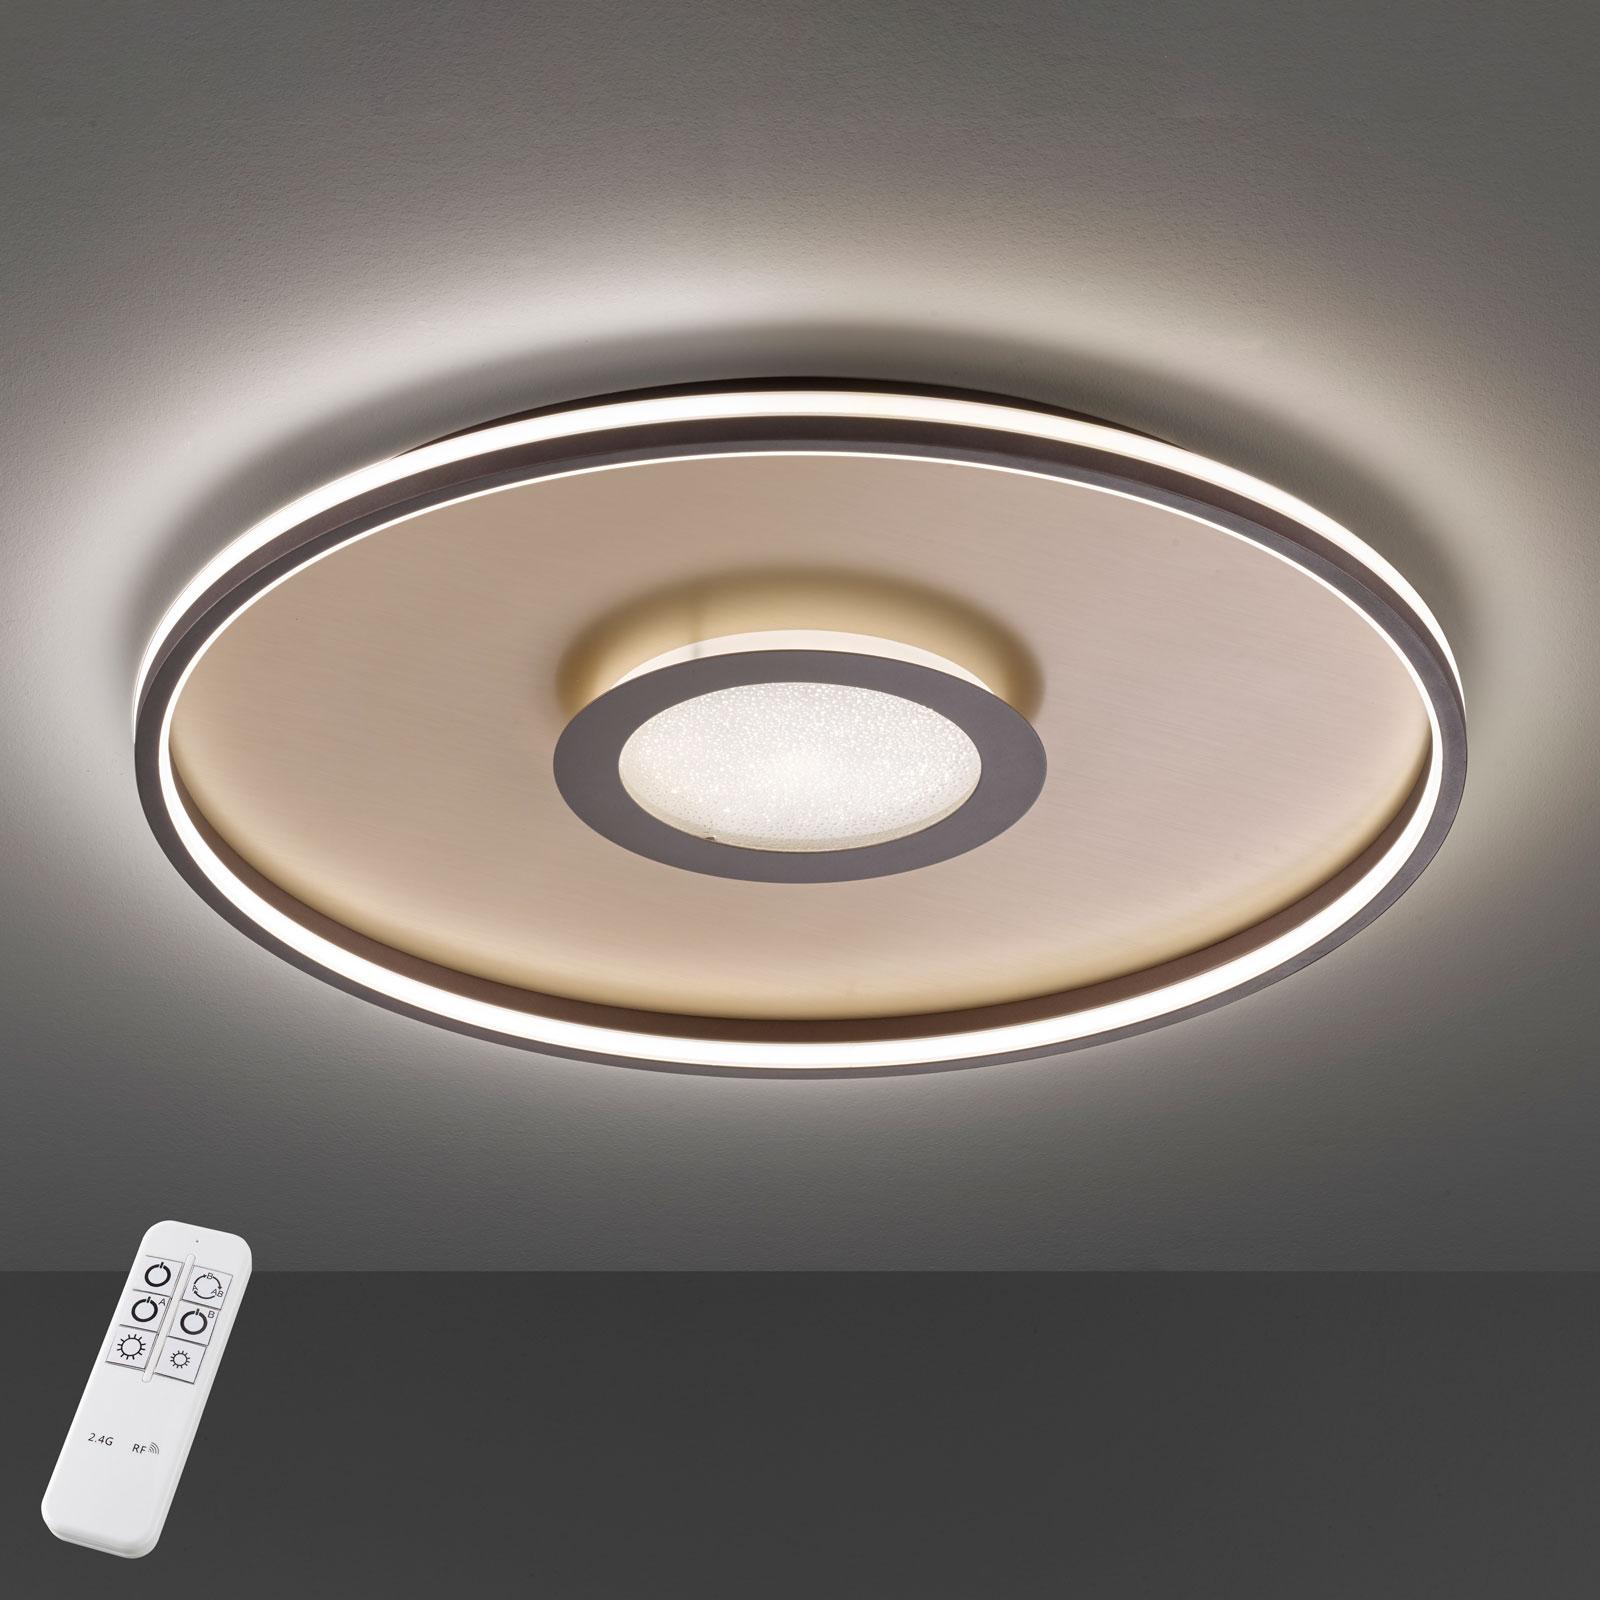 Lampa sufitowa LED Bug okrągła, rdza 45cm